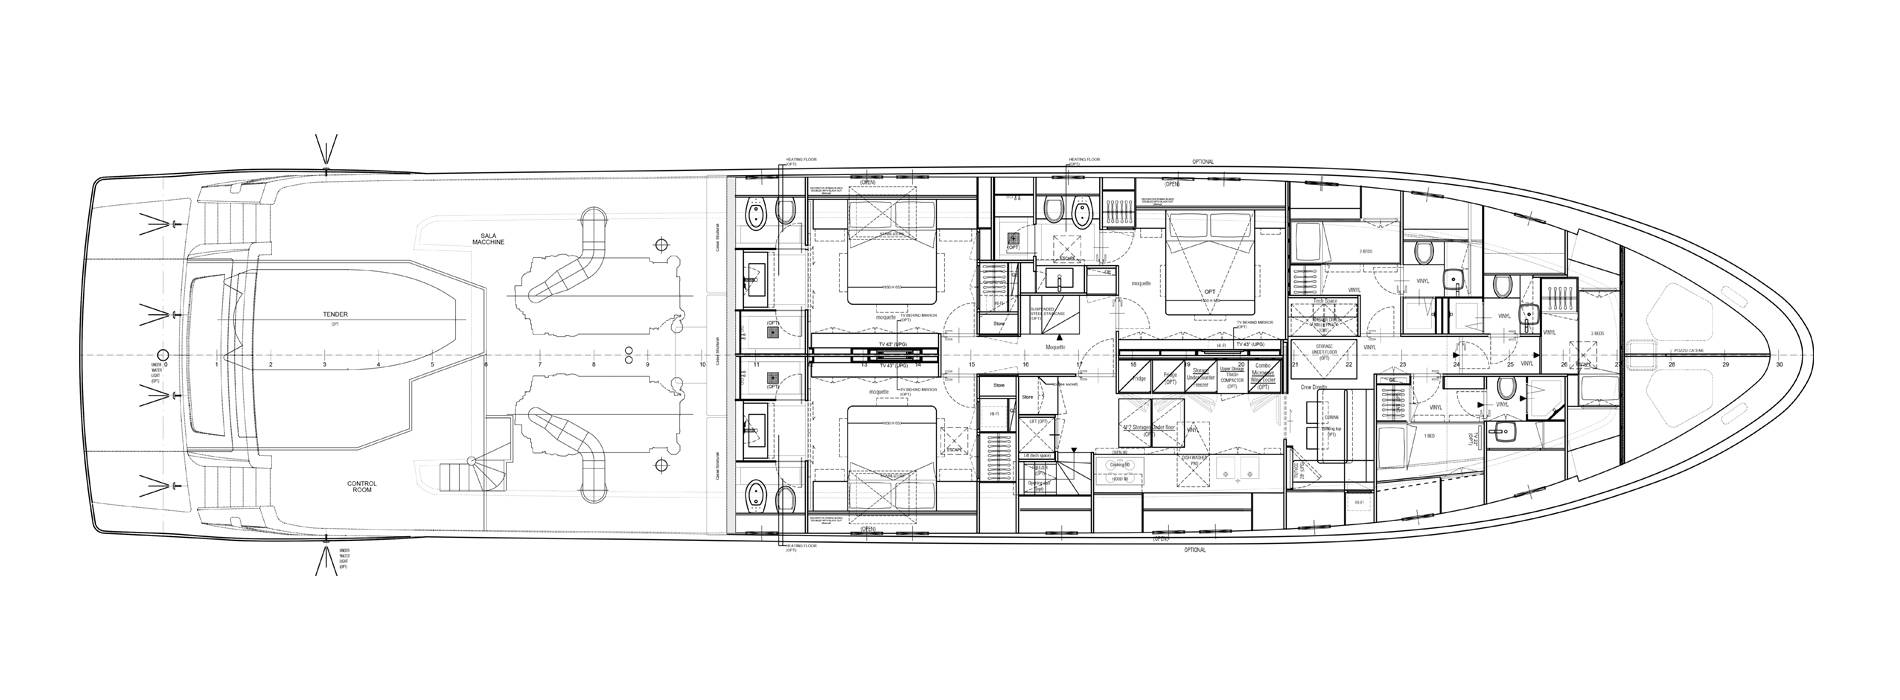 Sanlorenzo Yachts SL106-725 Lower Deck